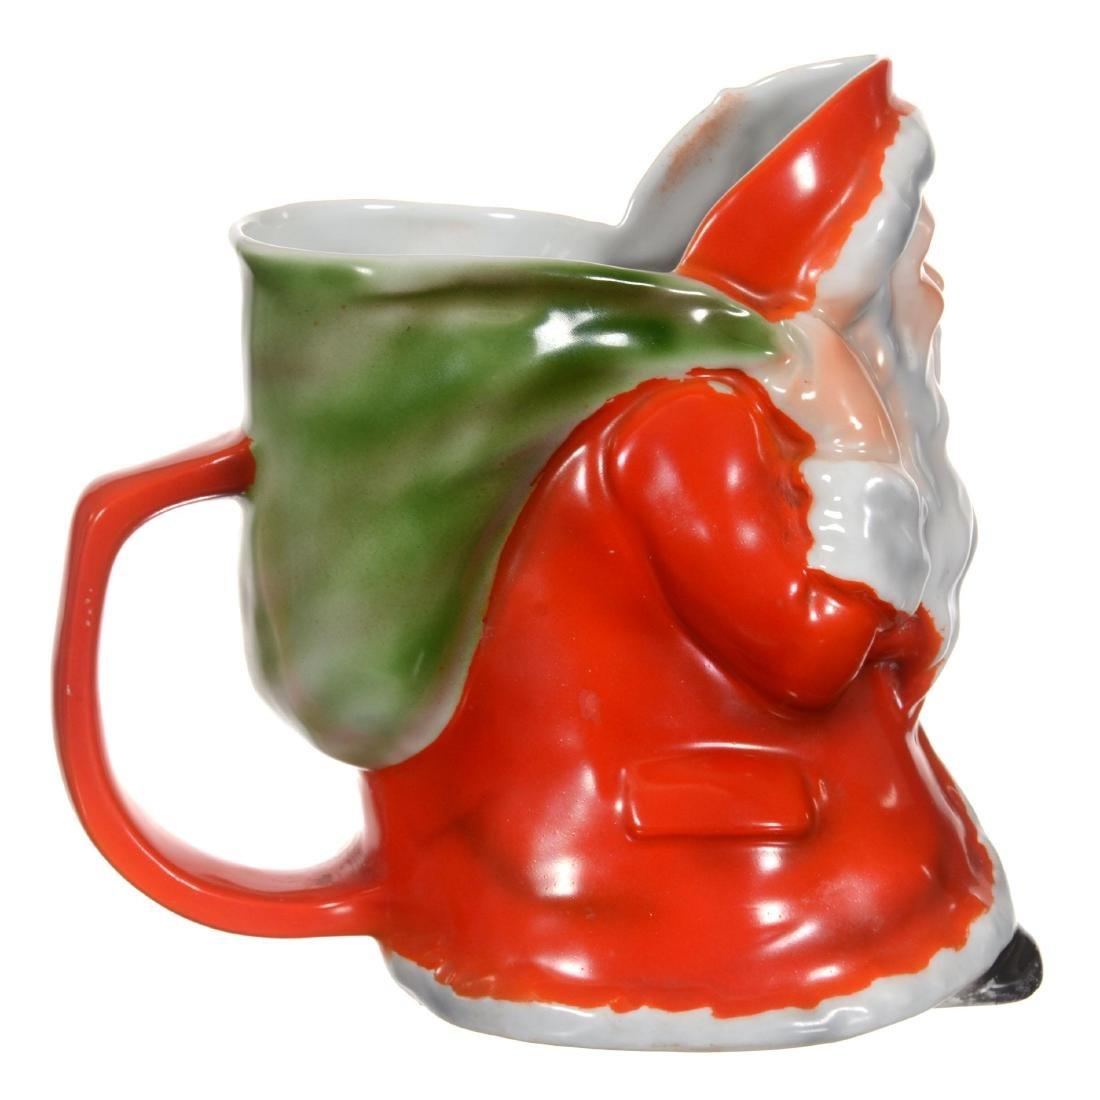 Royal Bayreuth Santa Claus Lemonade Pitcher - 2